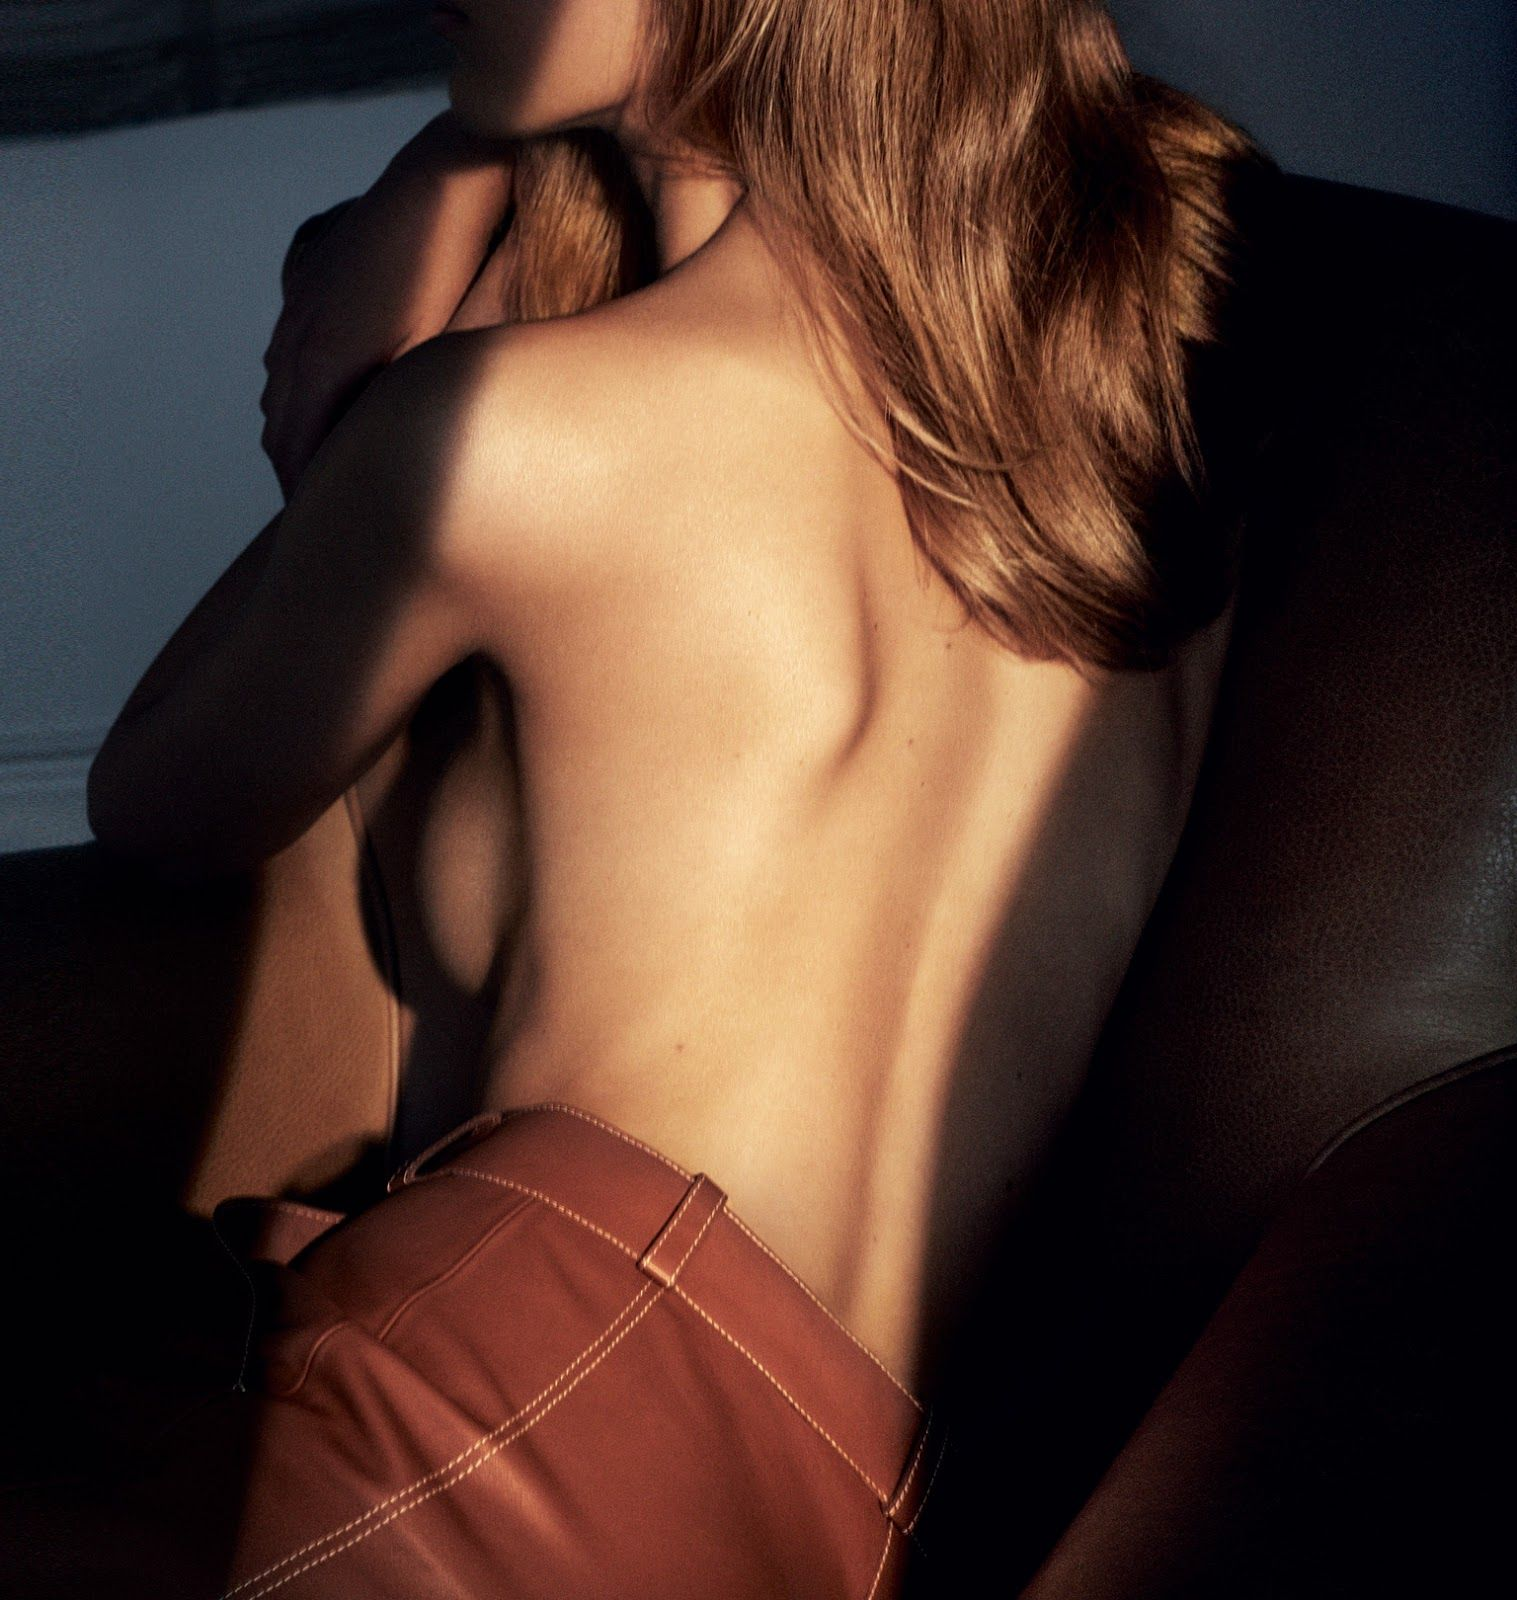 vanessa-axente-topless-3